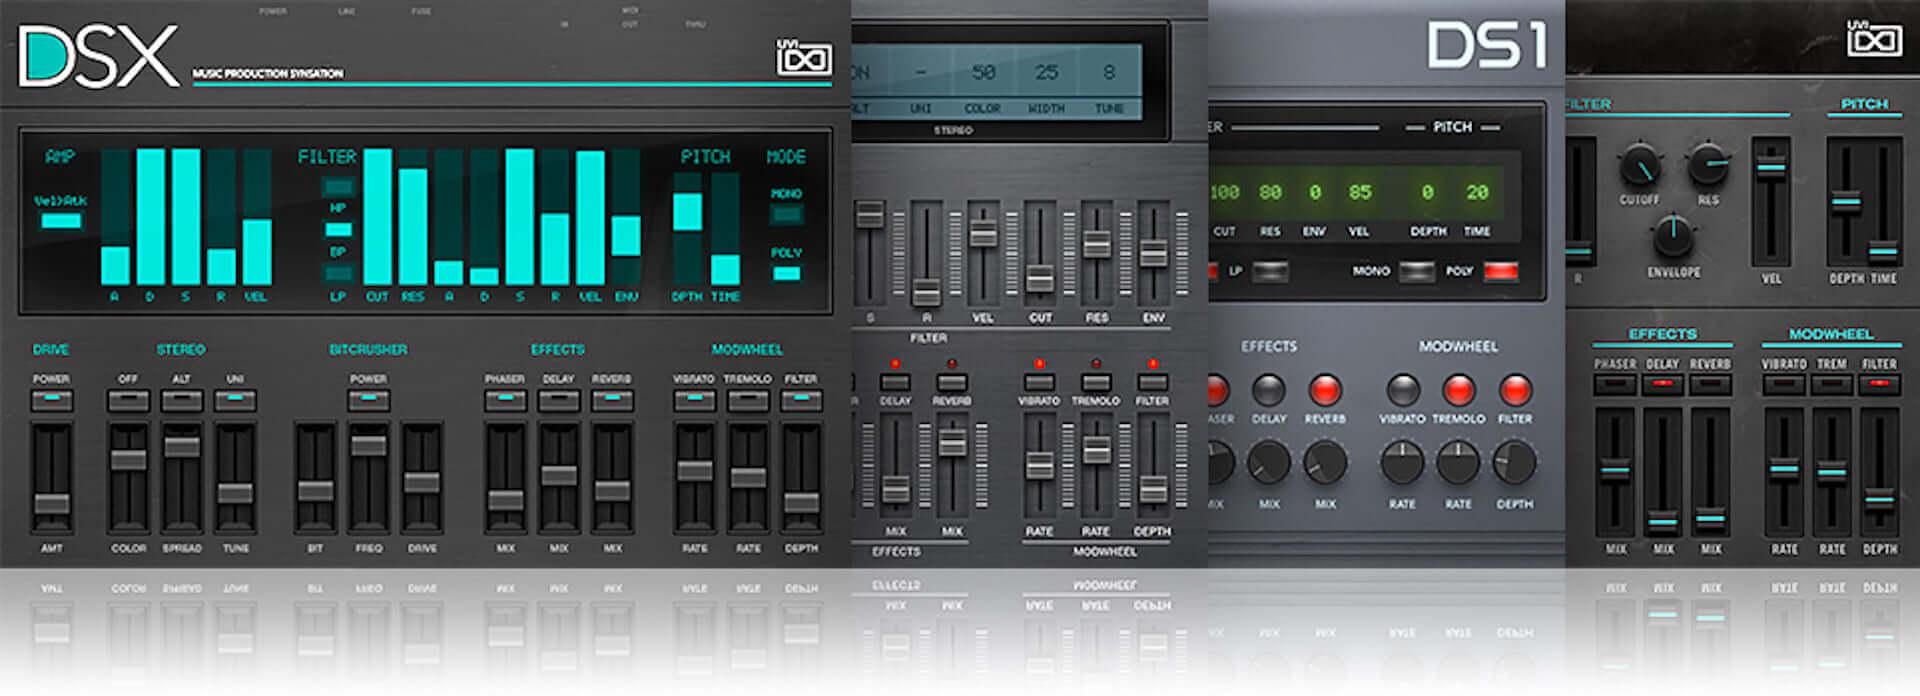 Studiologic製品購入でUVI『Digital Synsations』もプレゼント!期間限定キャンペーンが開始 music200402_studiologic_3-1920x696